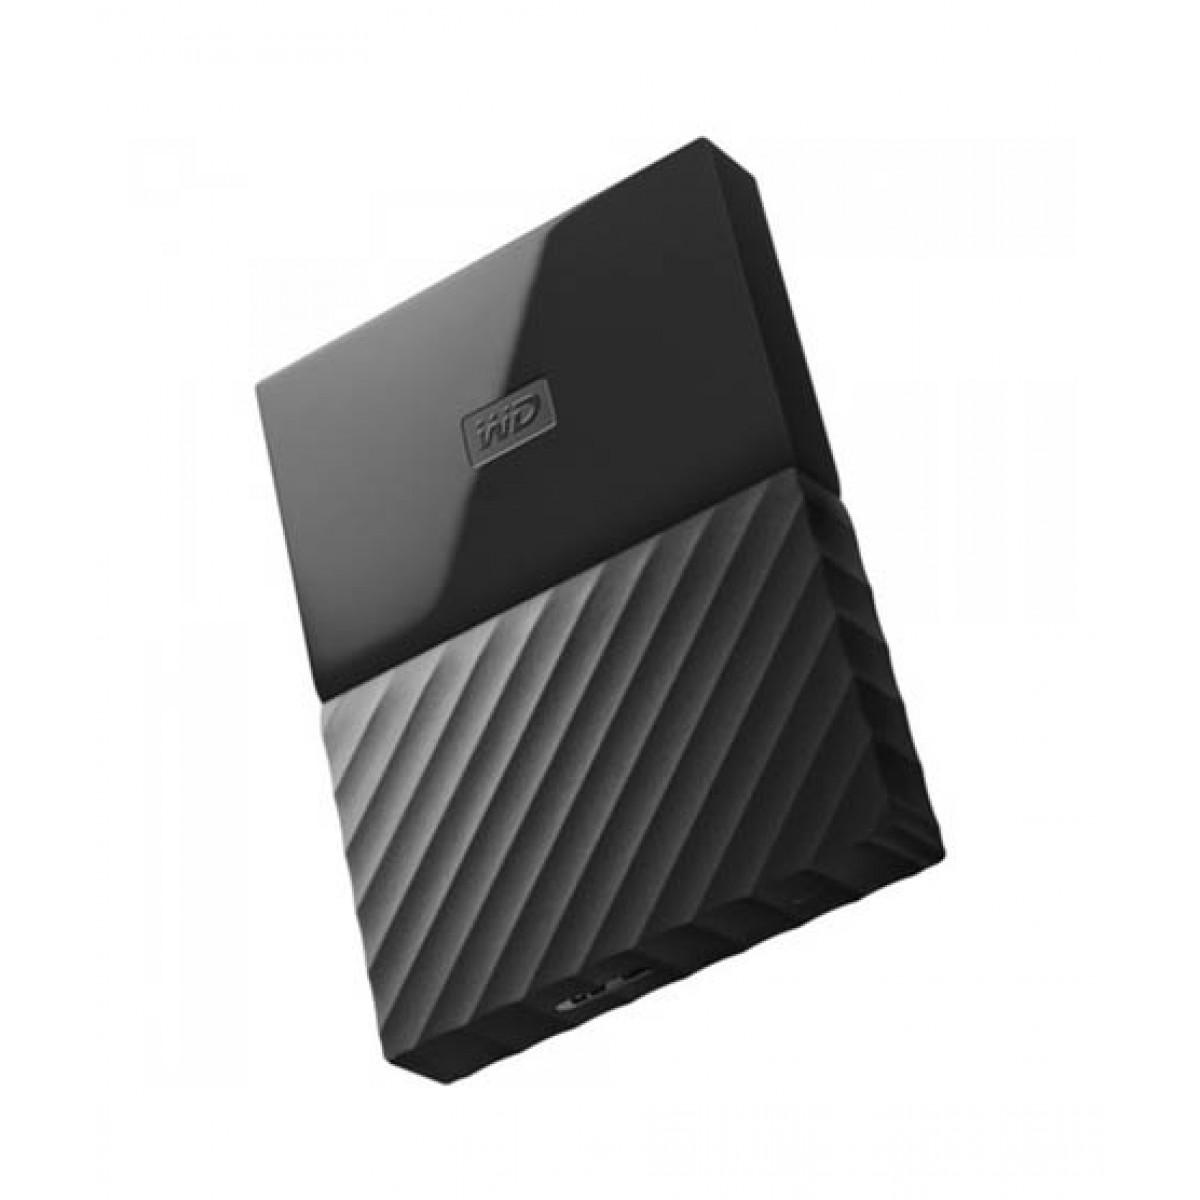 WD My Passport 1TB Portable Hard Drive Price in Pakistan | Buy WD ...